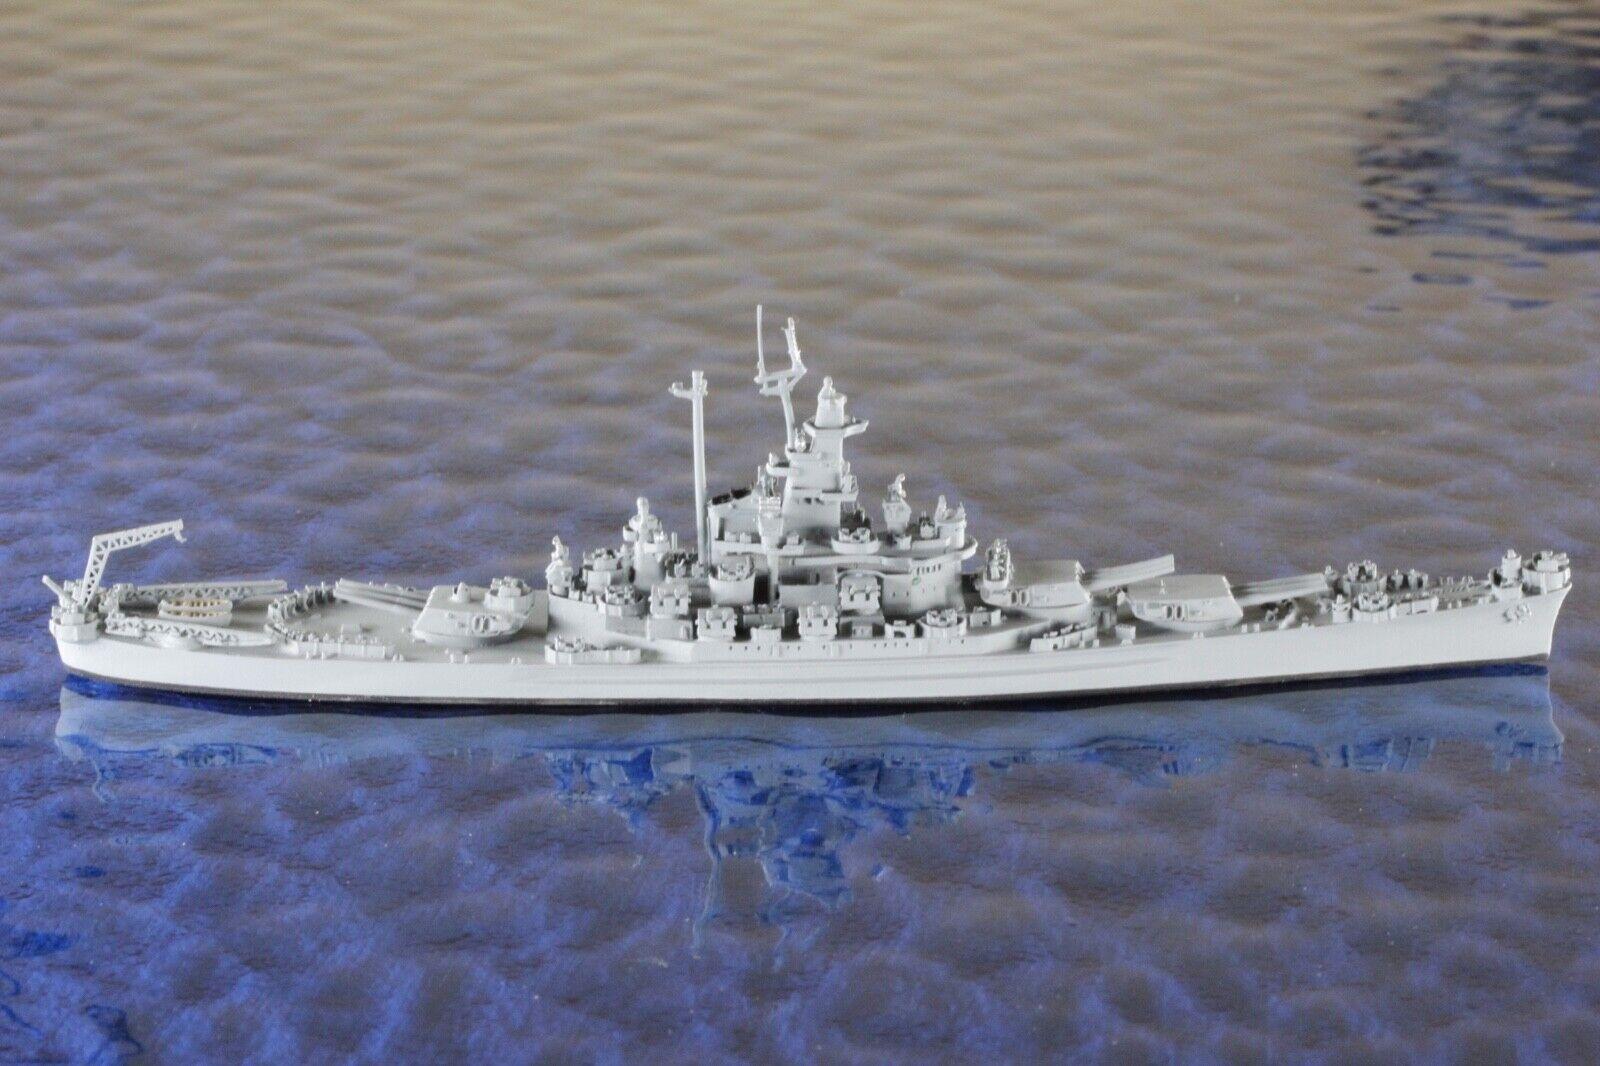 South Dakota Hersteller Neptun 1301a ,1:1250 Schiffsmodell